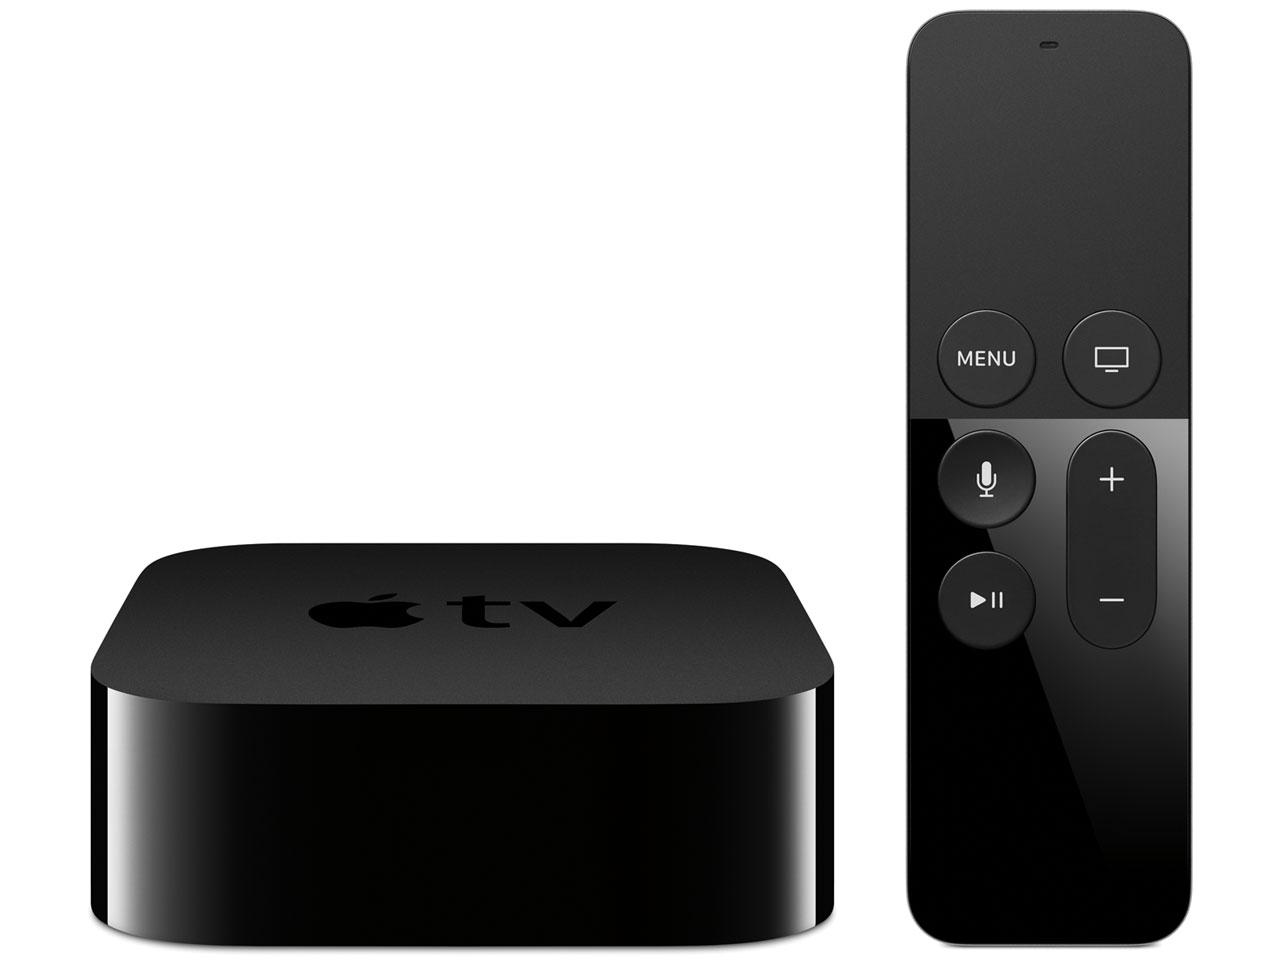 Apple(アップル) TV (第4世代)FGY52J/A 32GB【新品/MGY52J/Aの整備済製品】 送料無料